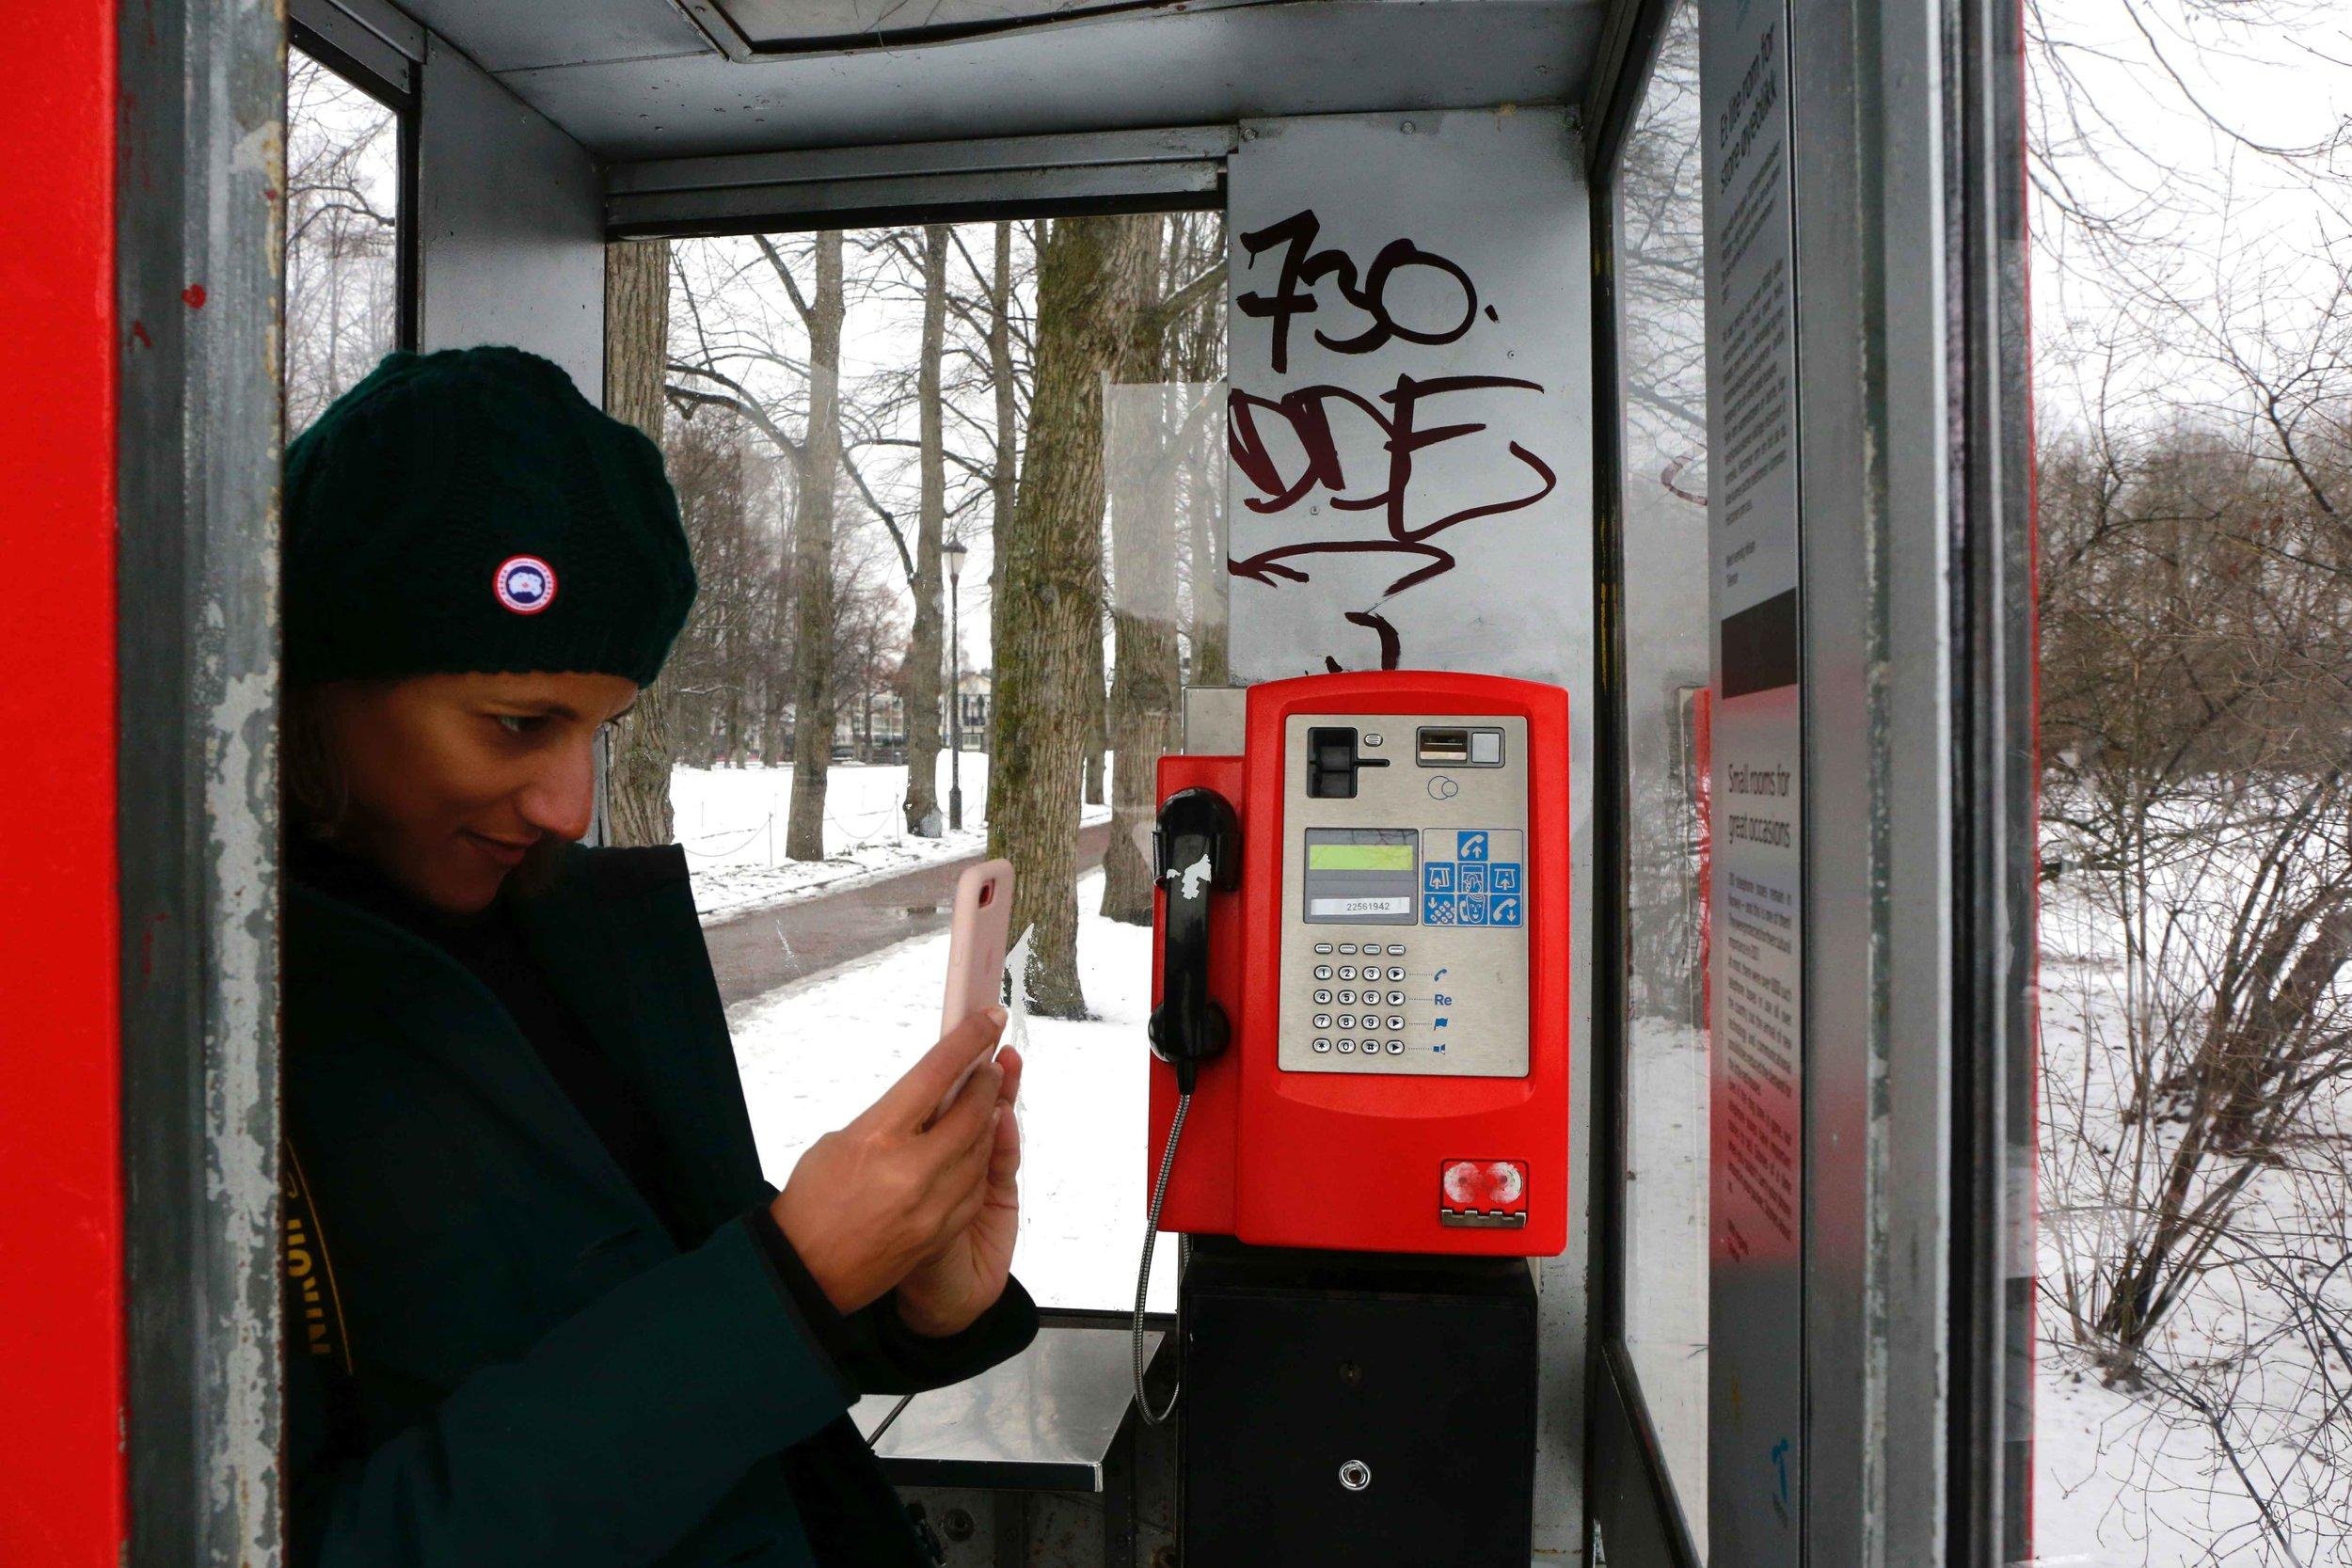 Red Telephone Booth, telefonkiosk, Vigeland Sculptor Park, Oslo, Norway. Photo: Oslo Photo Tour Image©thingstodot.com